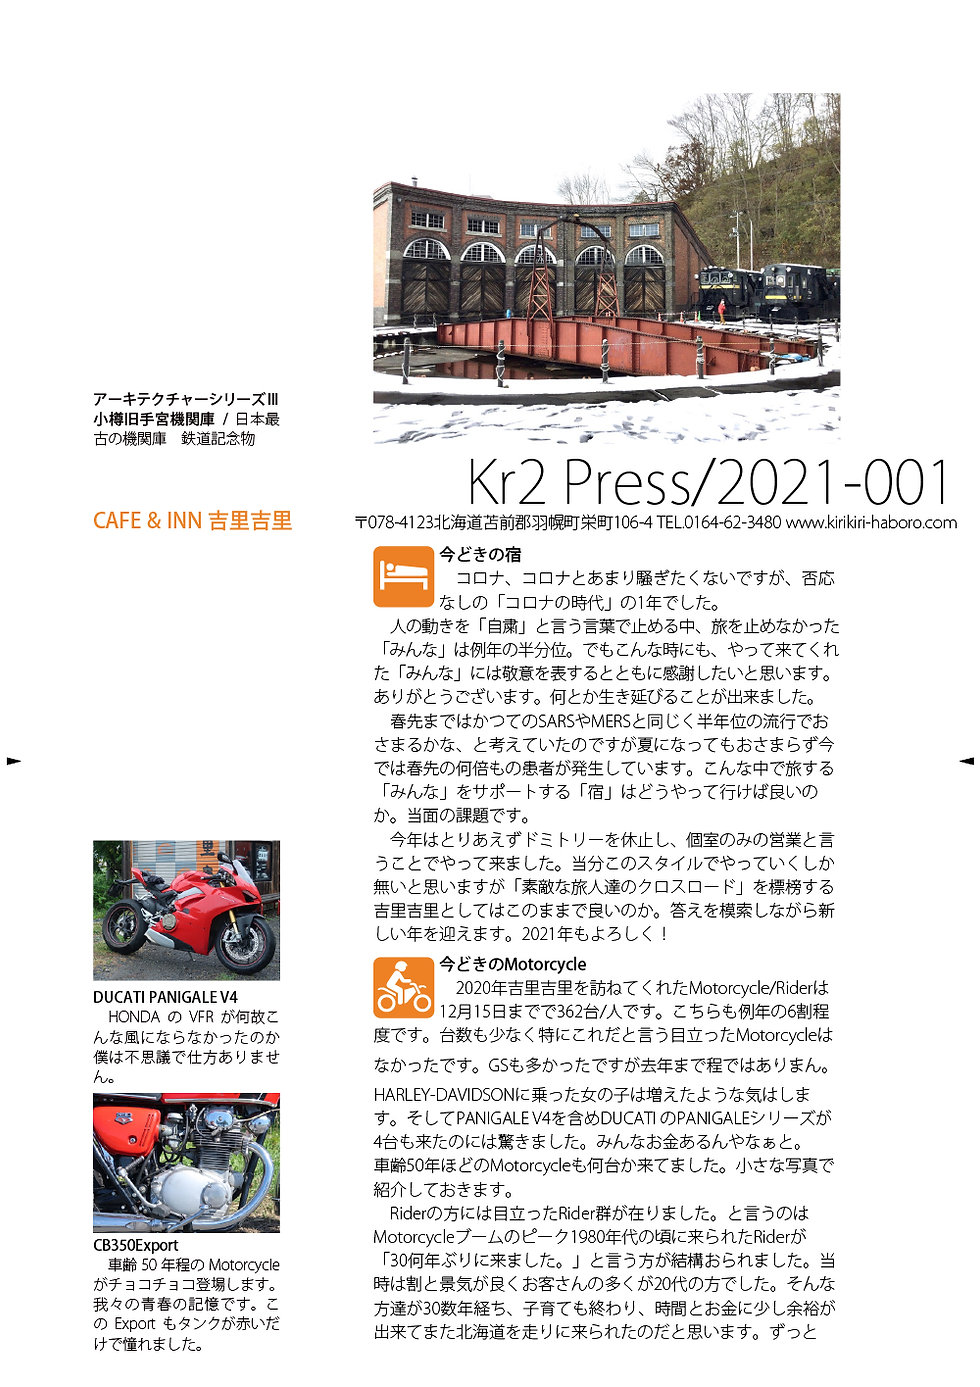 2021Kr2Press001.jpg